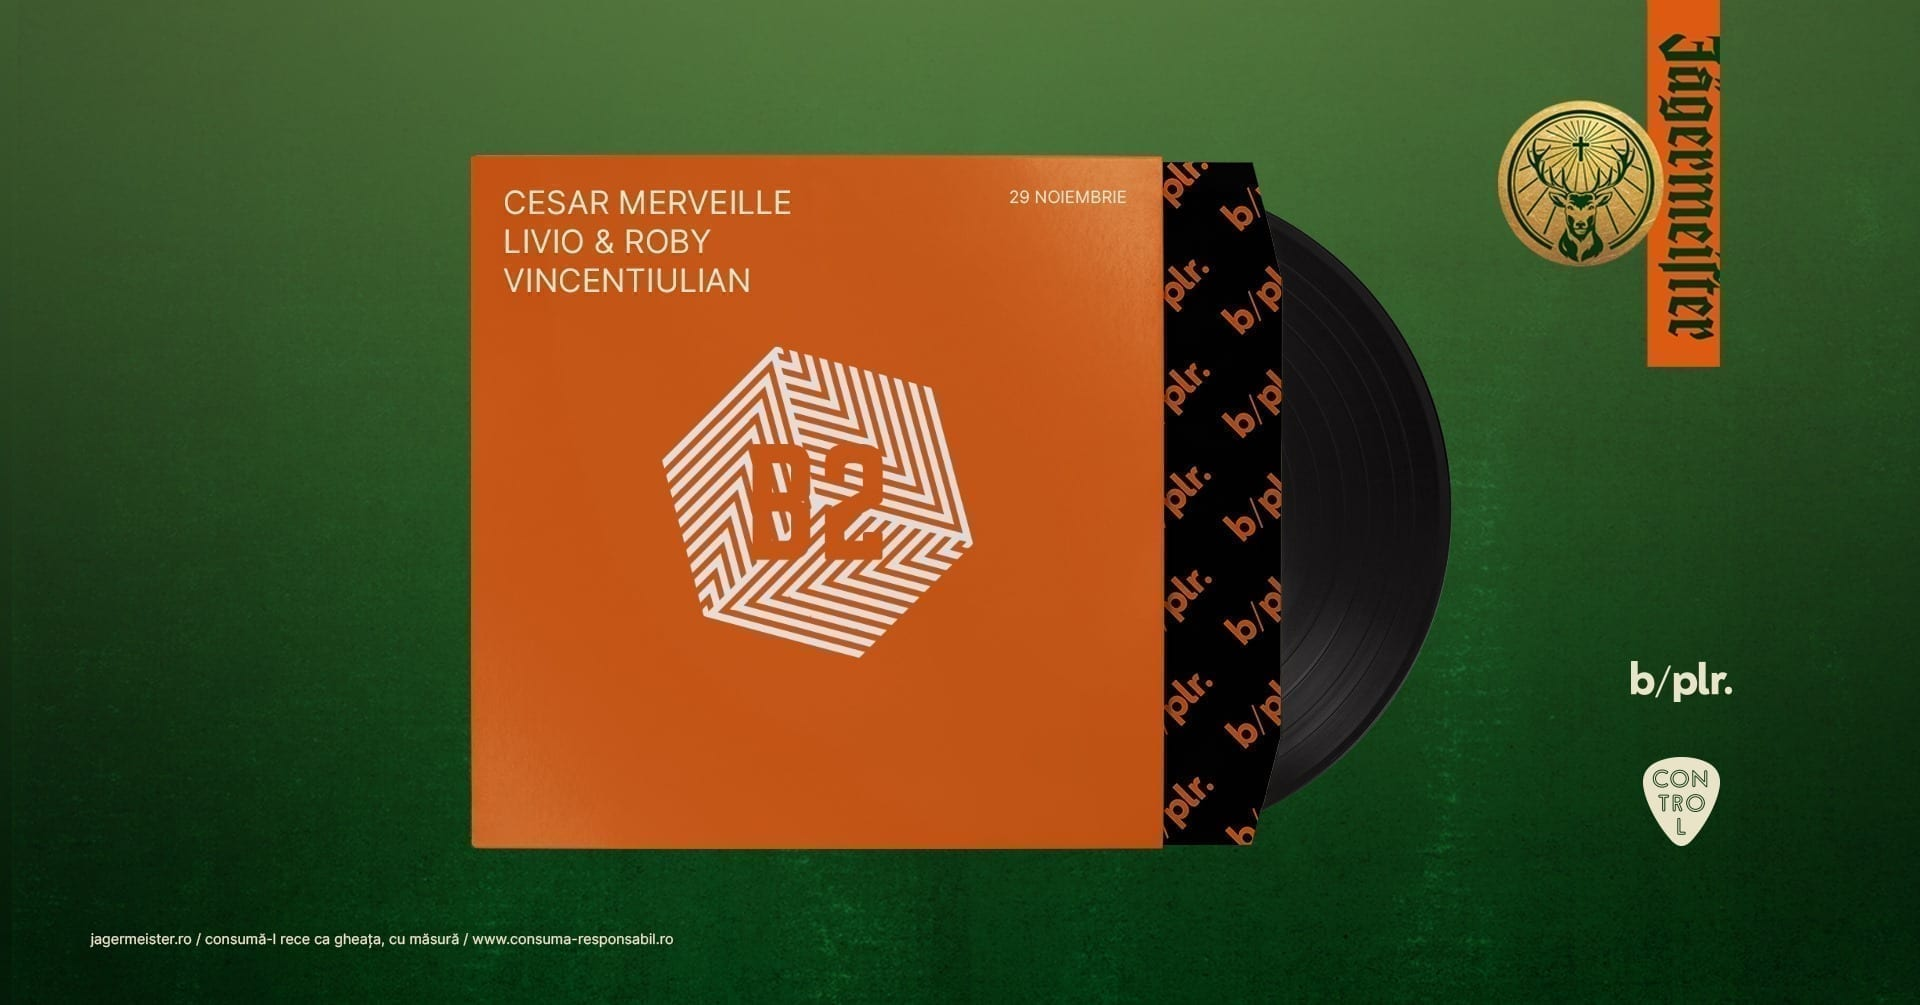 B:plr. Friday - Cesar Merveille, Livio & Roby, Vincentiulian